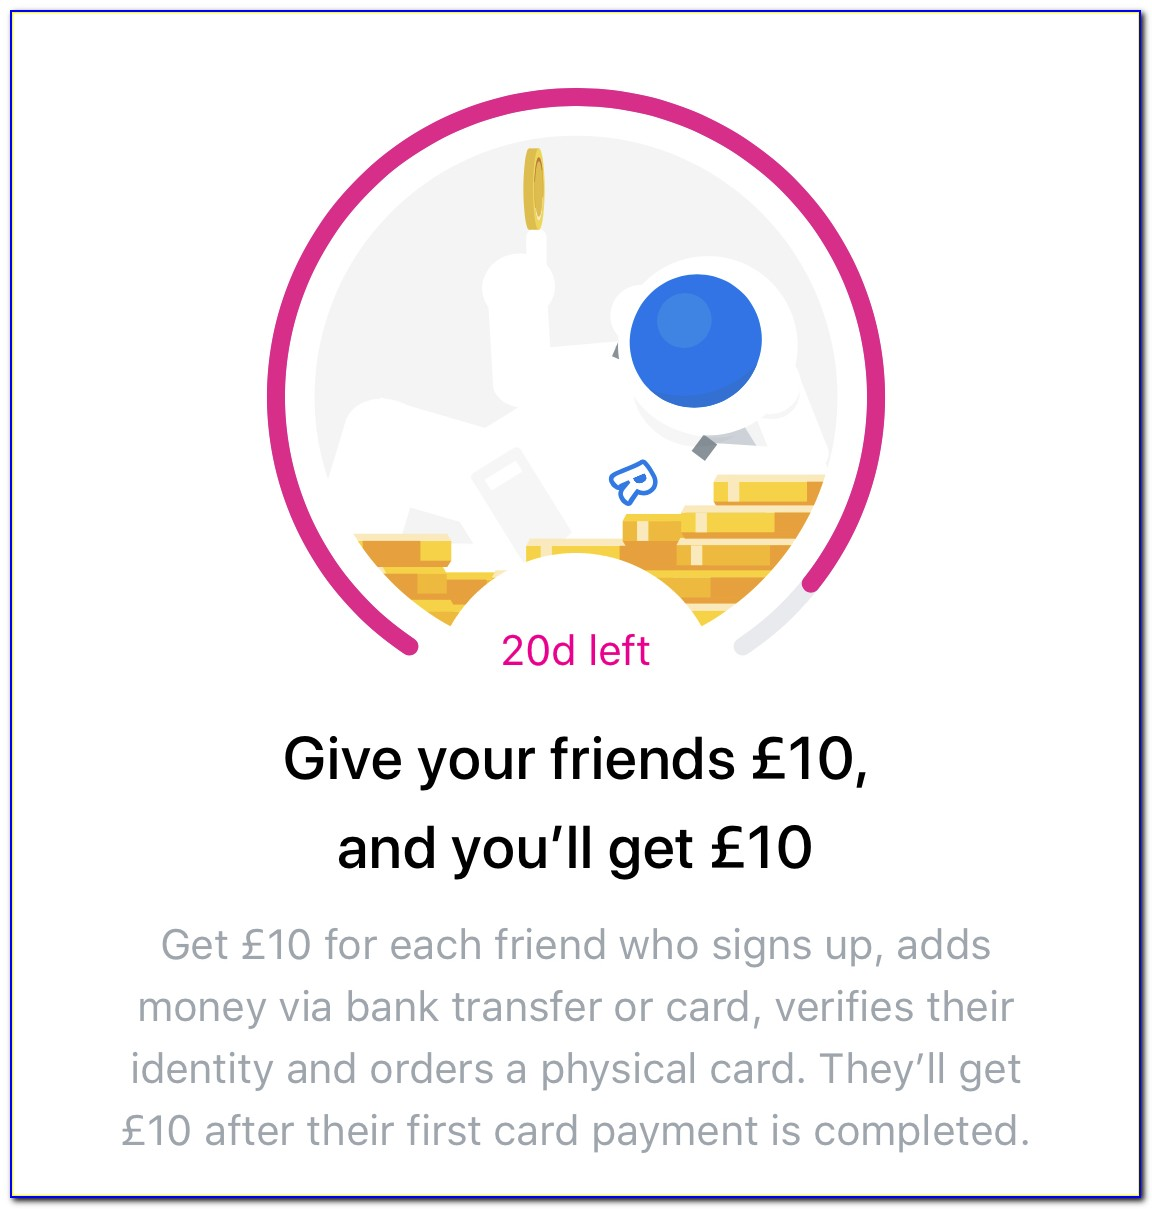 Revolut Free Card Offer